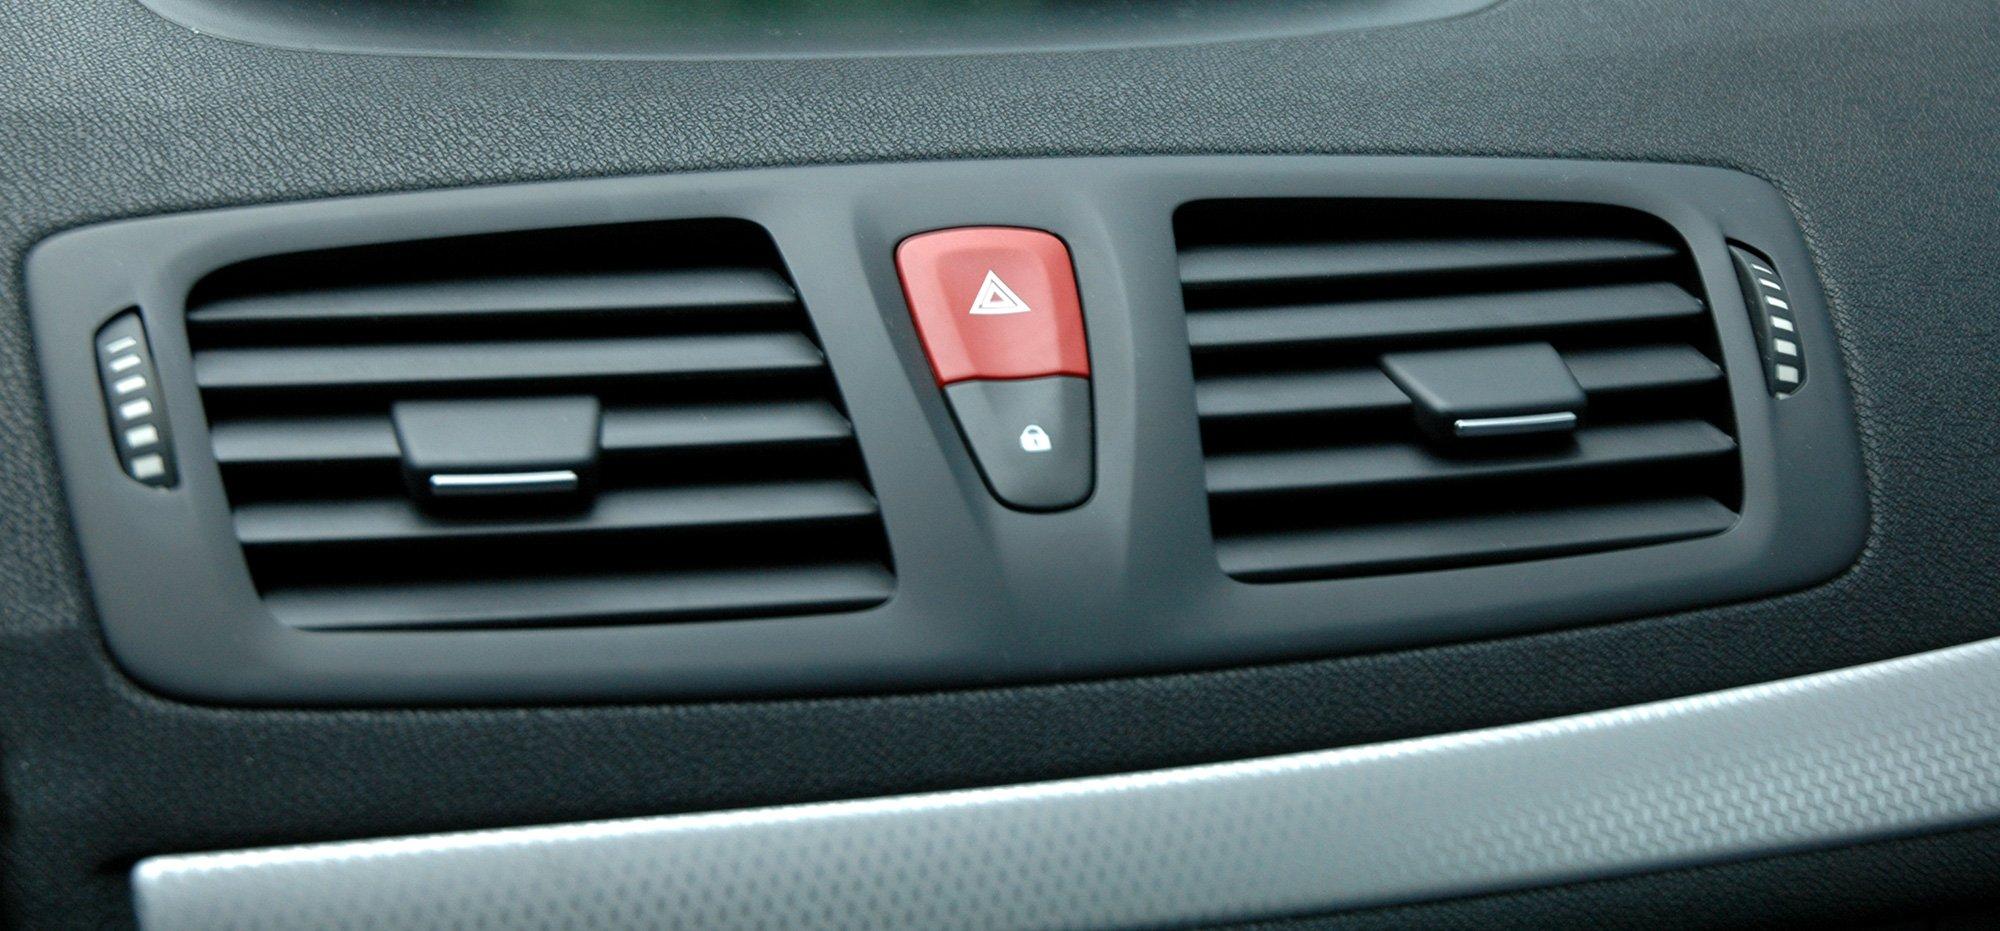 Vehicle AC vent